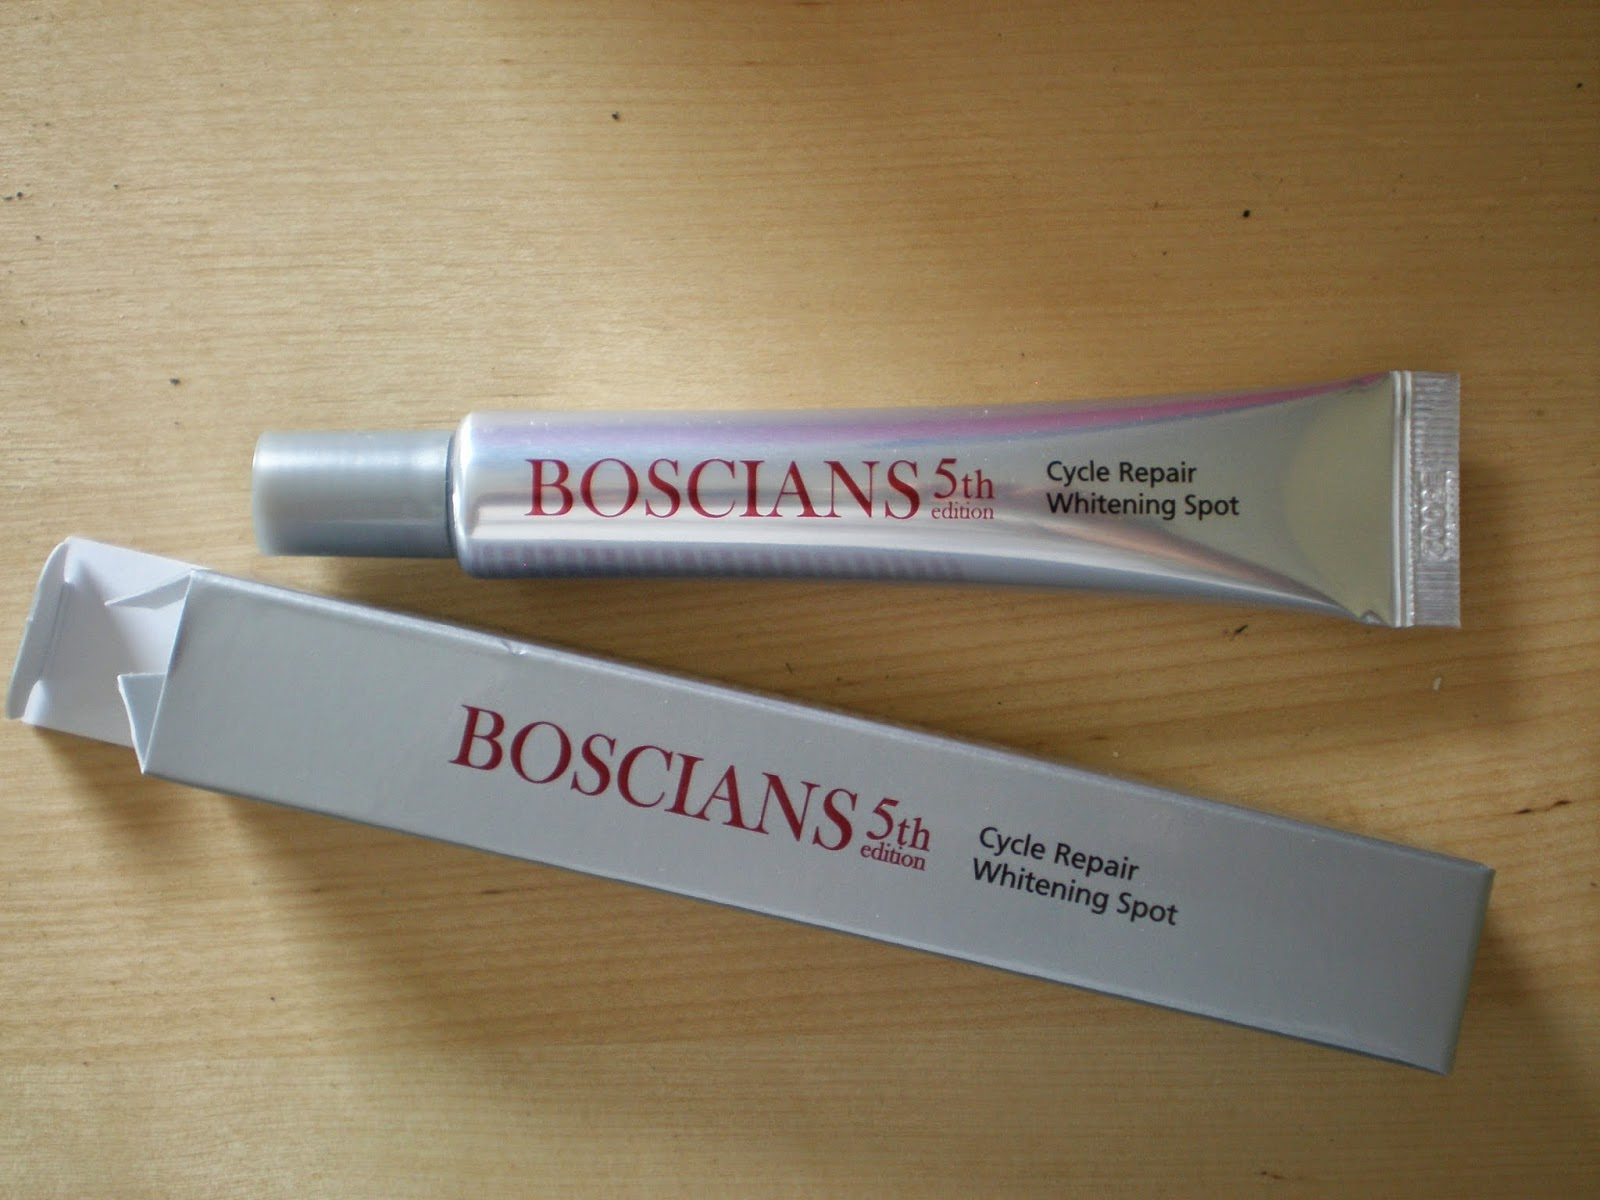 BOSCIANS Cycle Repair Whitening Spot